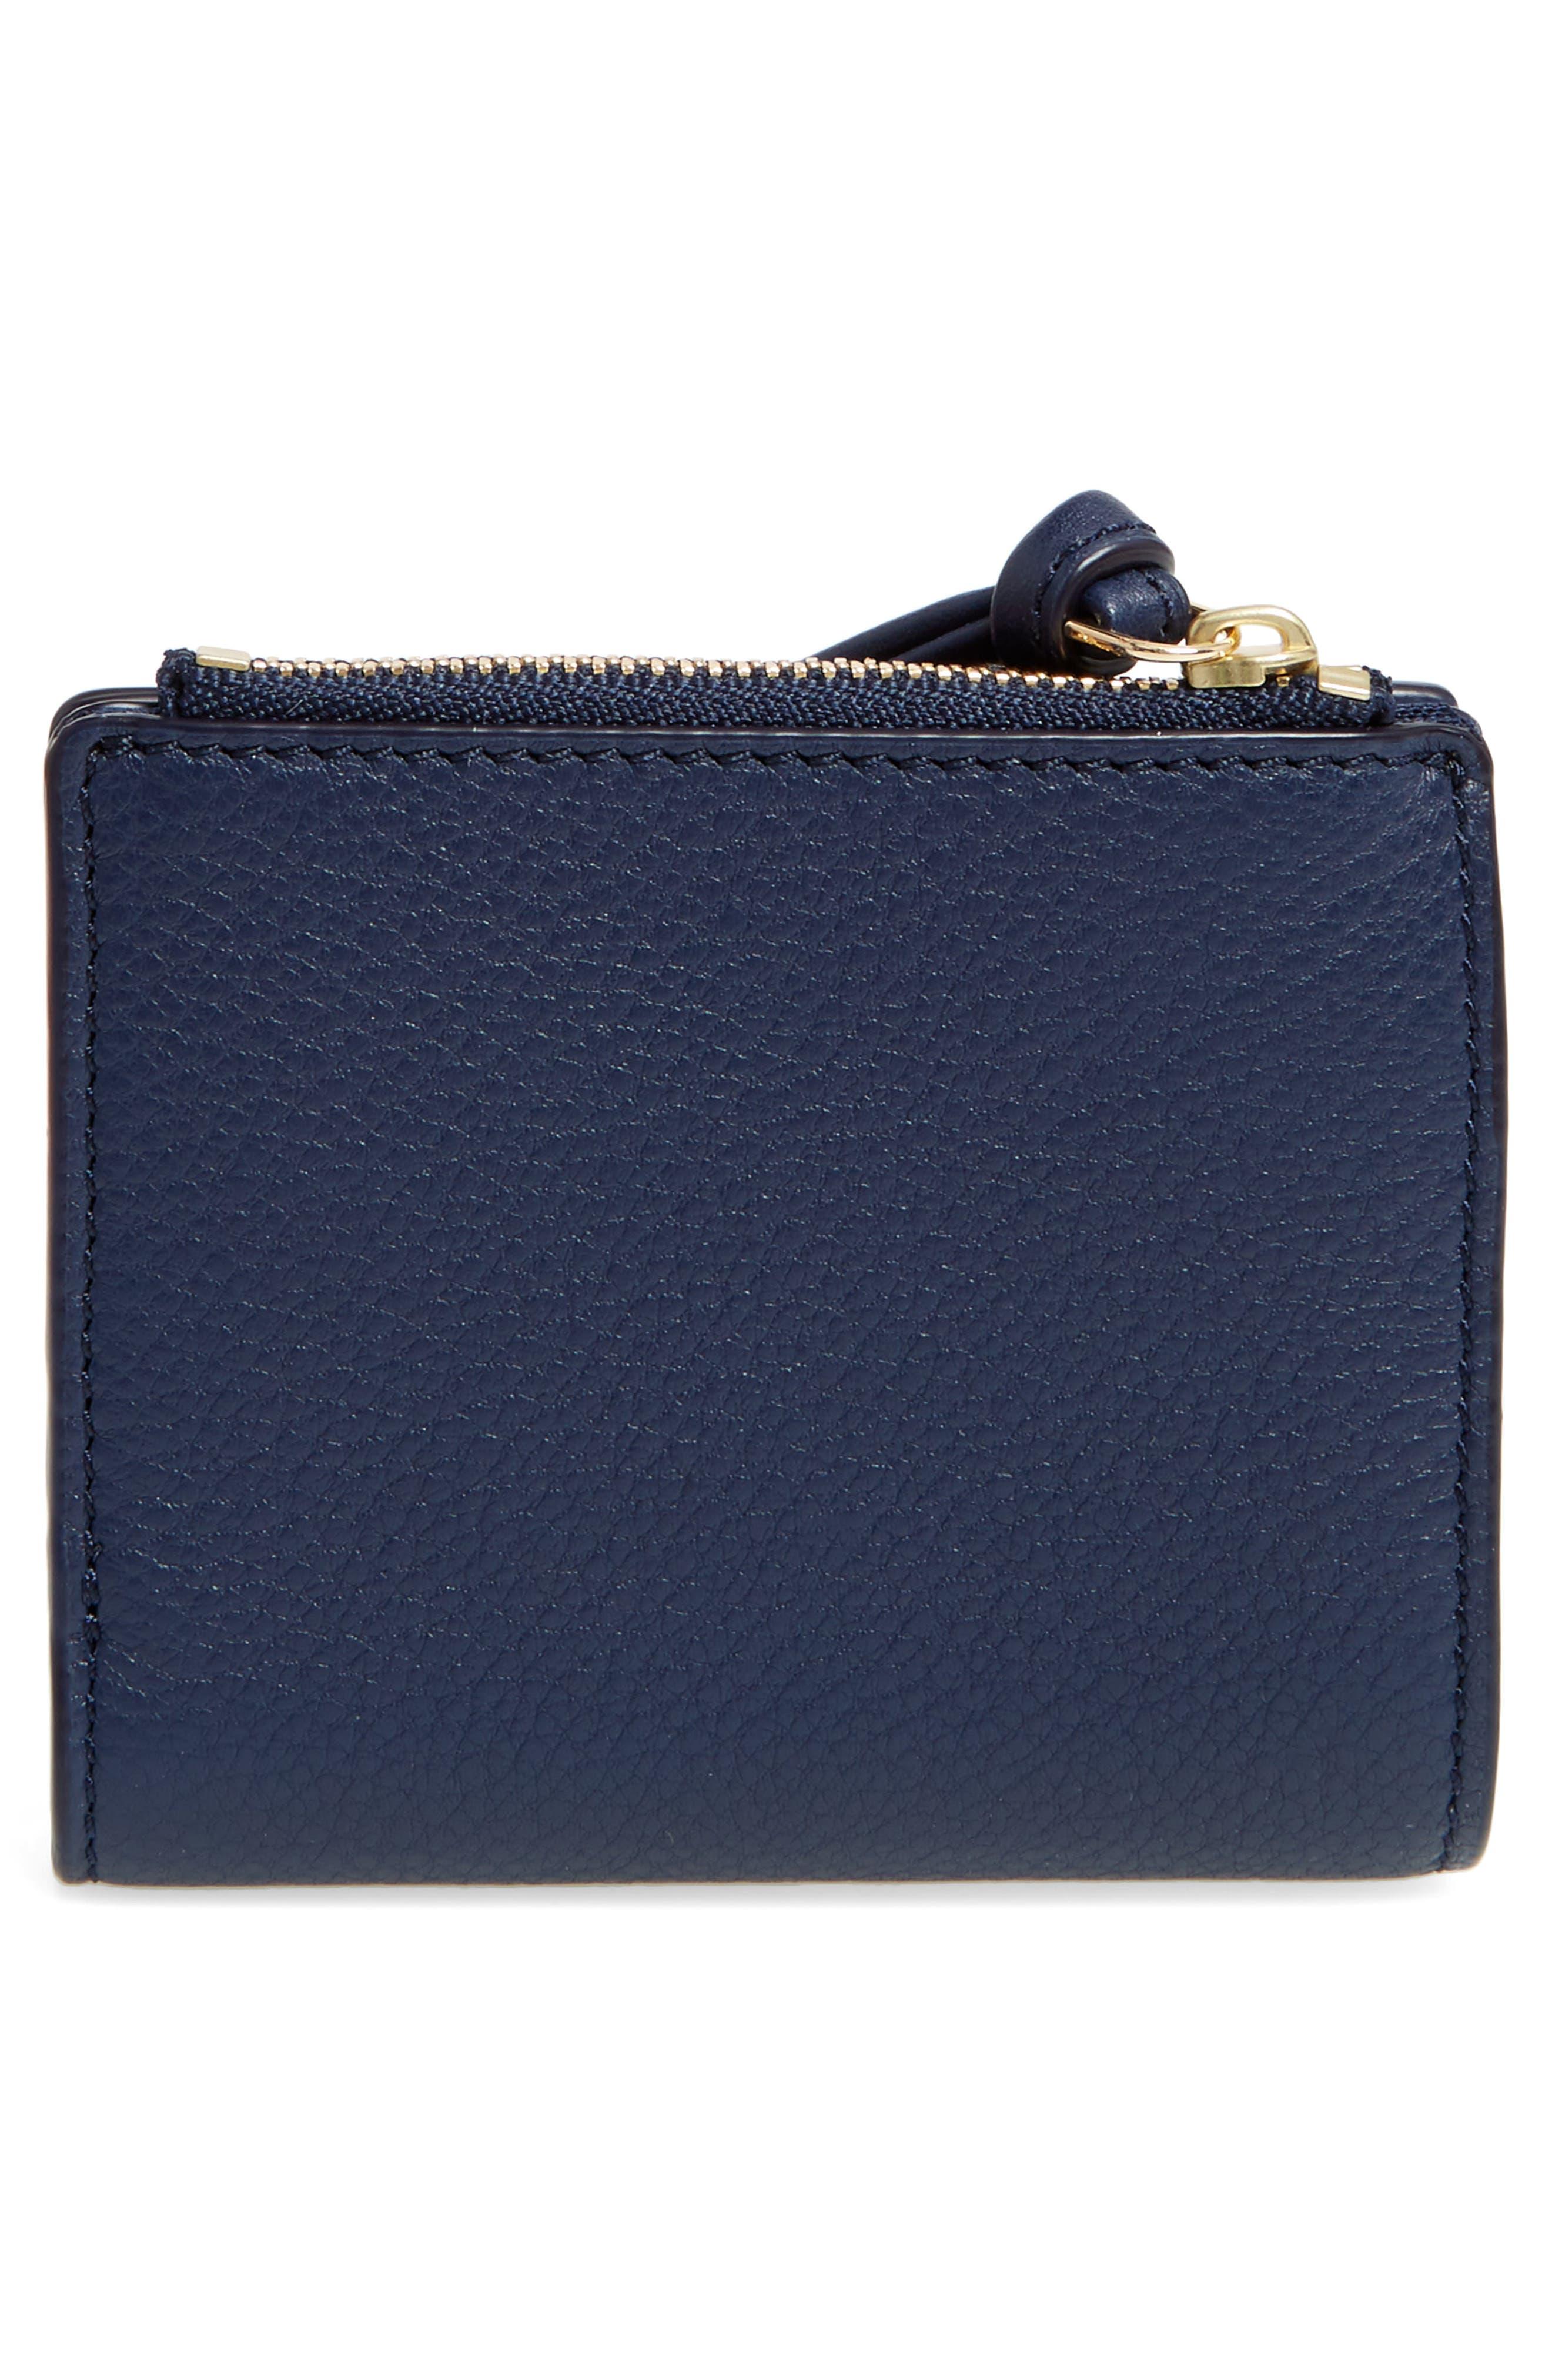 Alternate Image 3  - Tory Burch 'Mini Harper' Leather Wallet